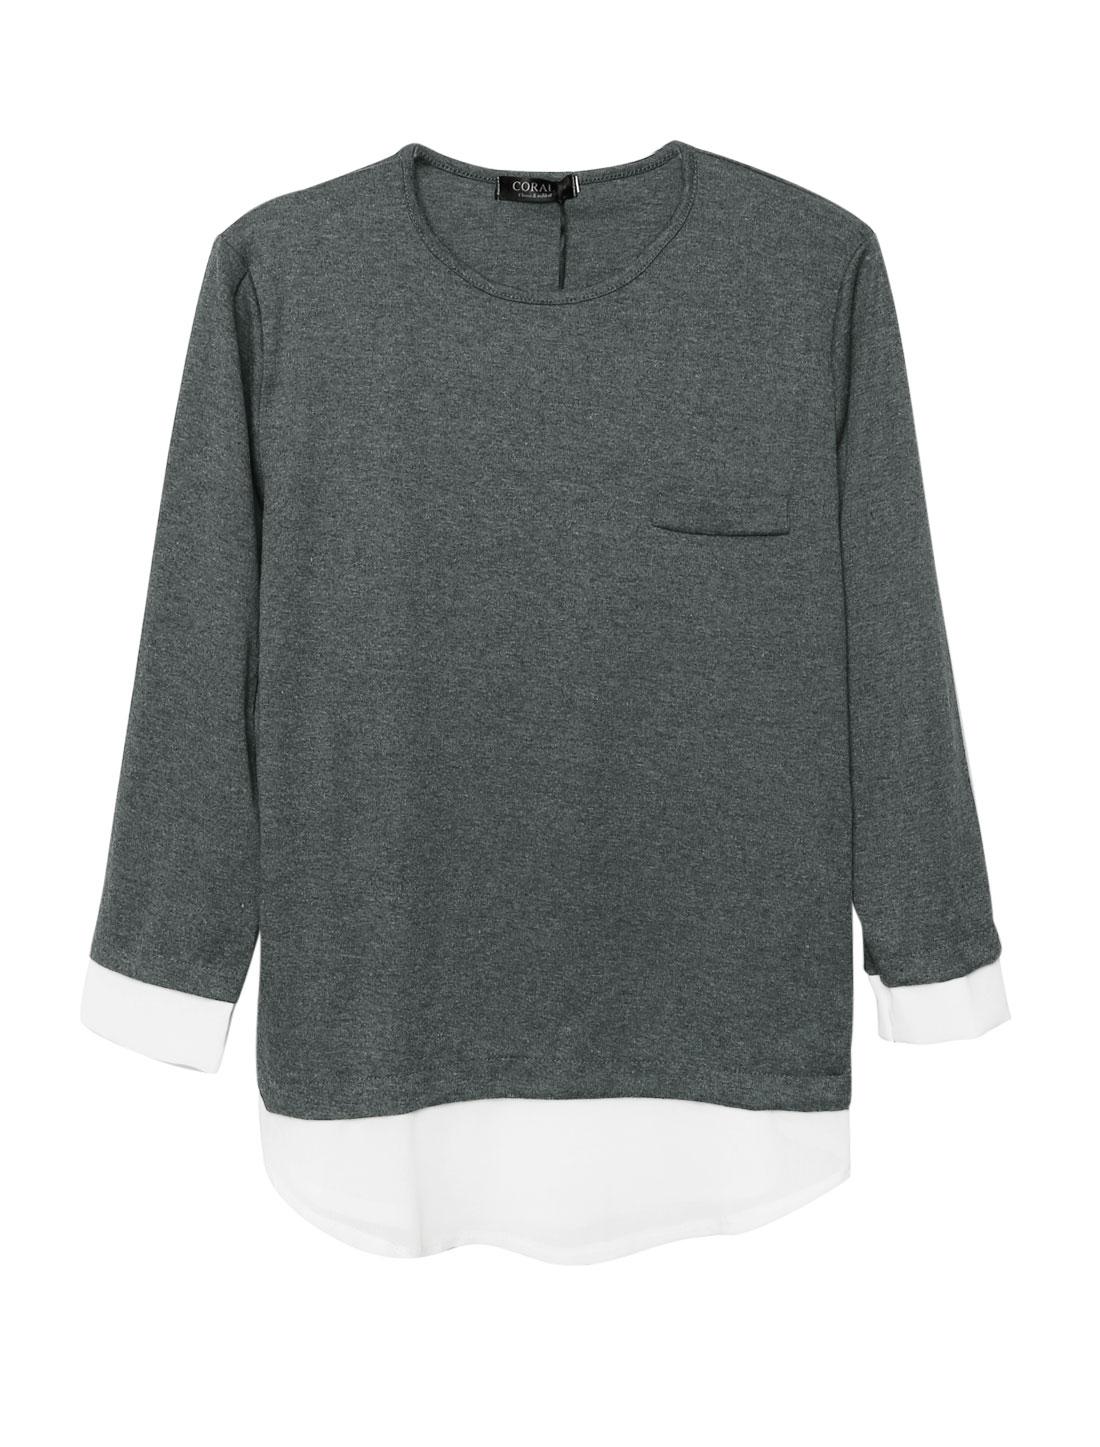 Ladies Panel Design Loose Dark Gray Tunic Shirt M